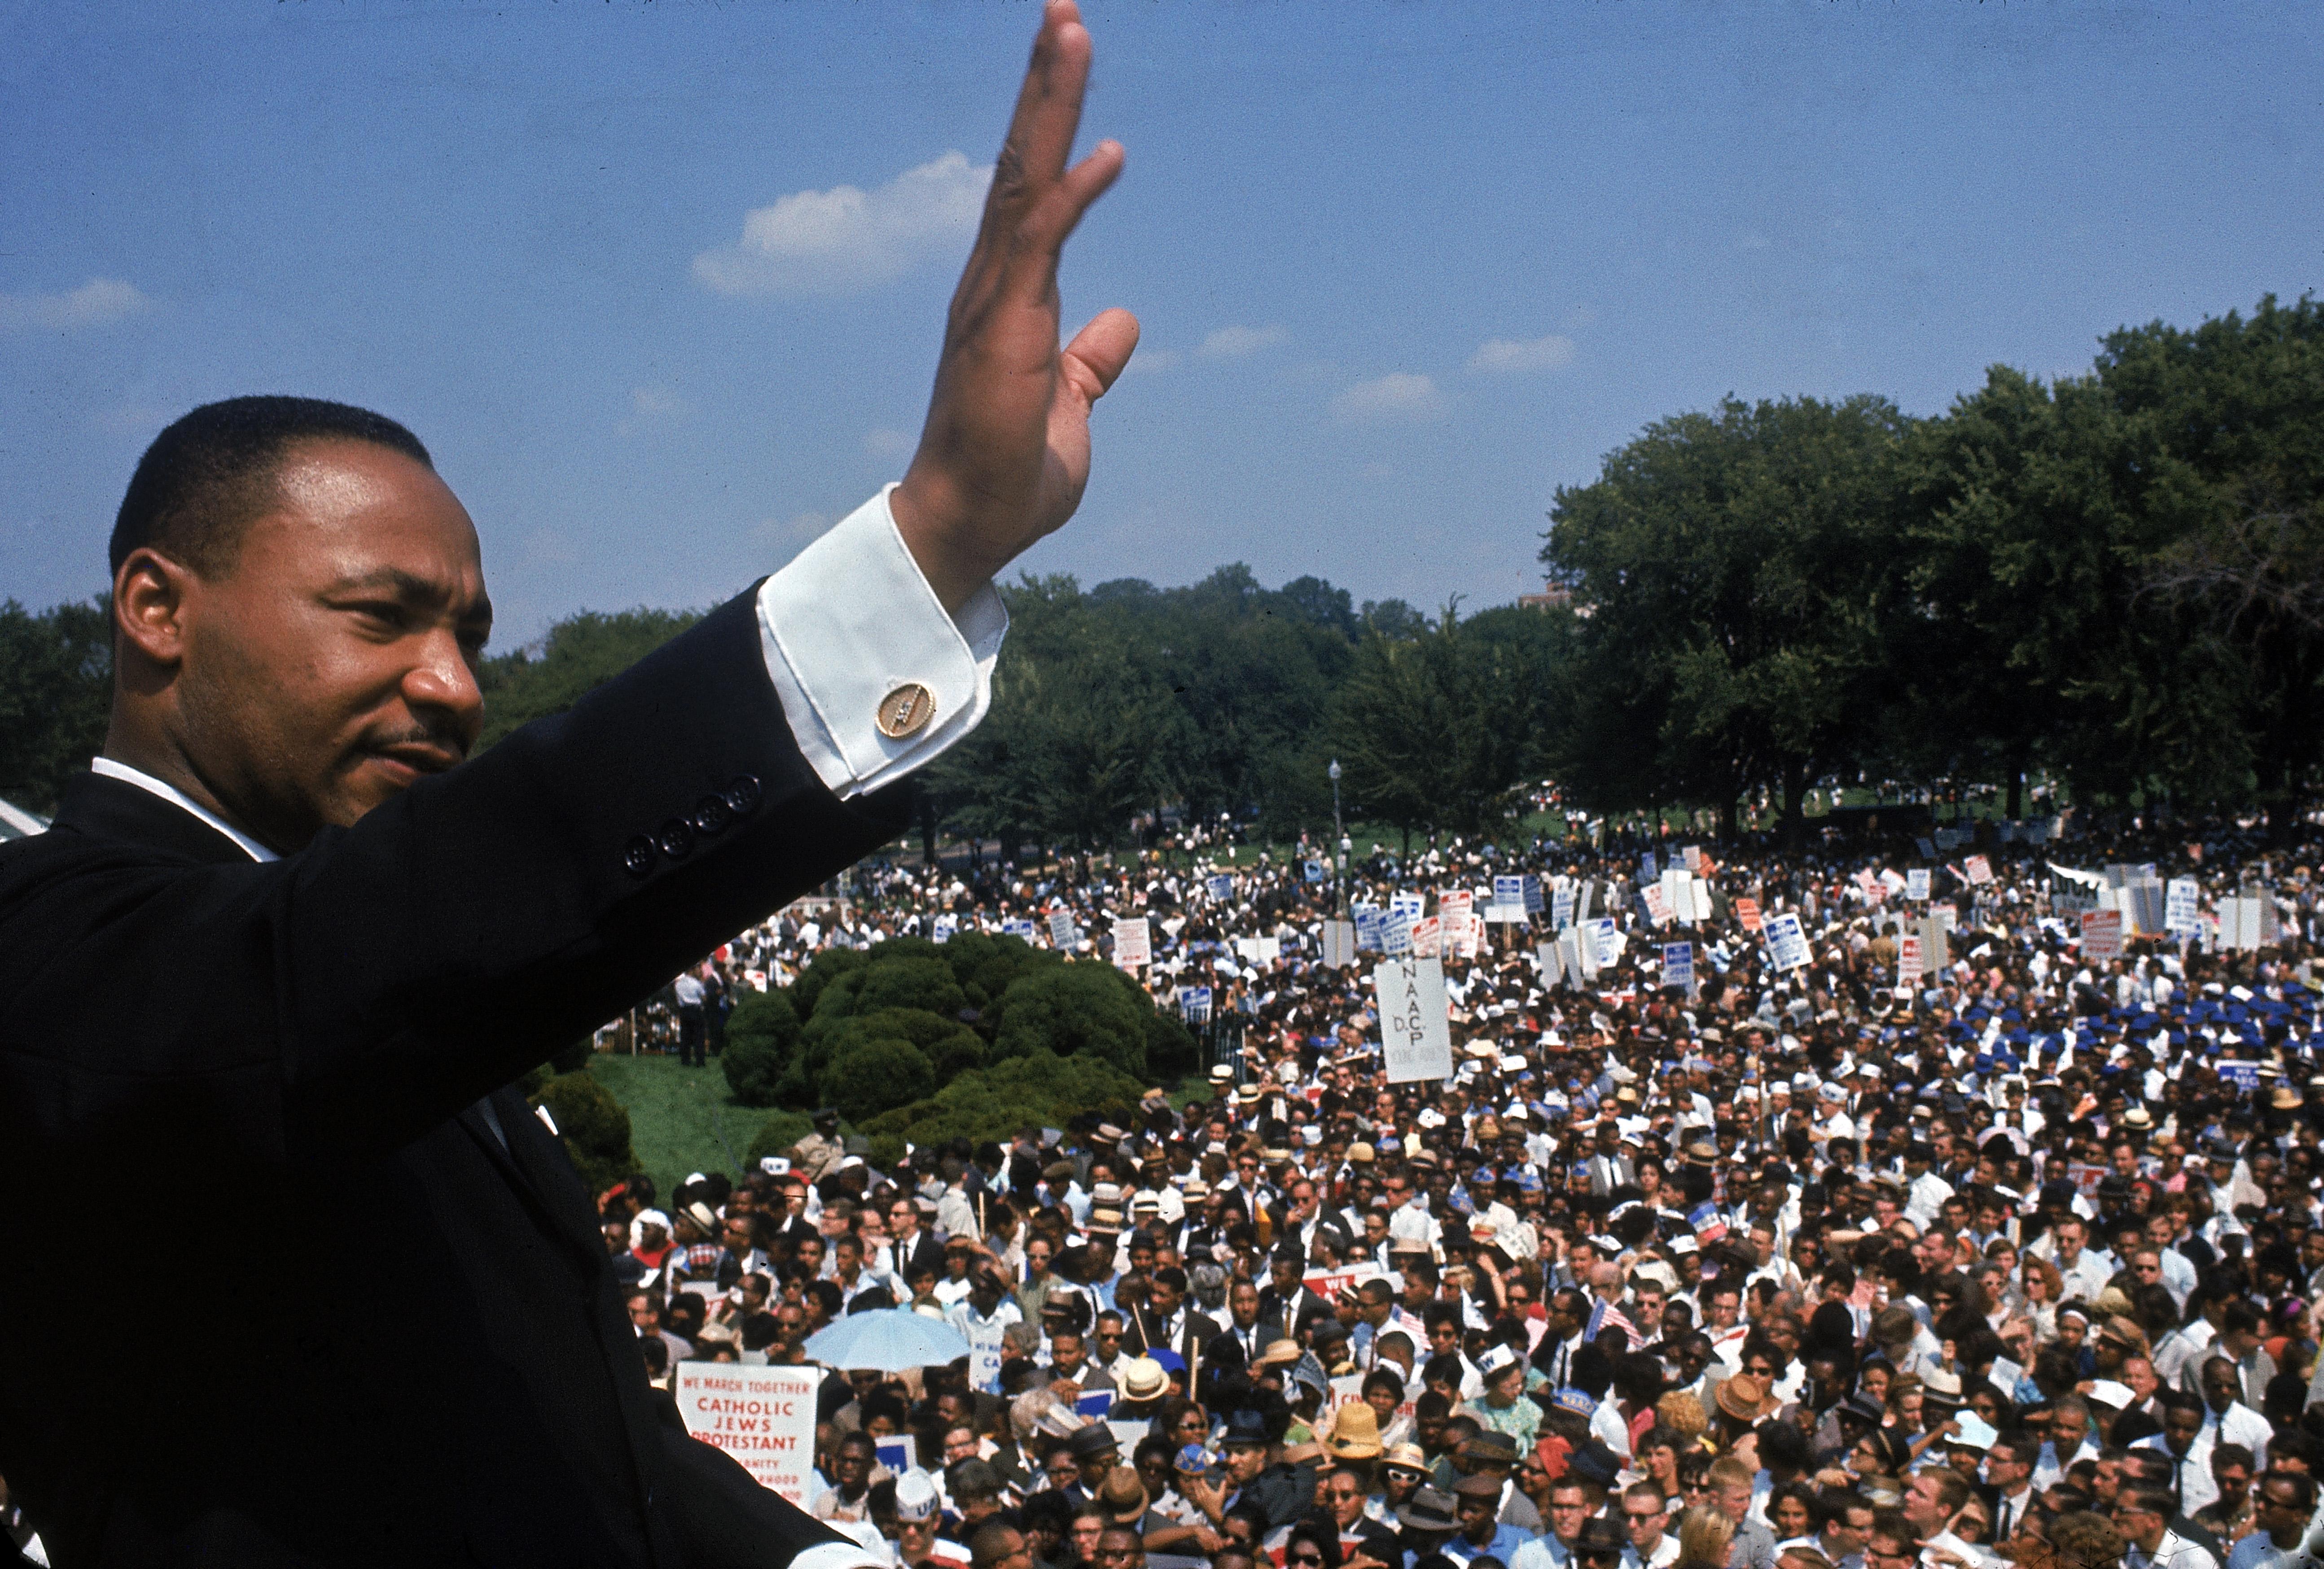 Activistul și predicatorul Martin Luther King Jr., comemorat la 50 de ani de la asasinare